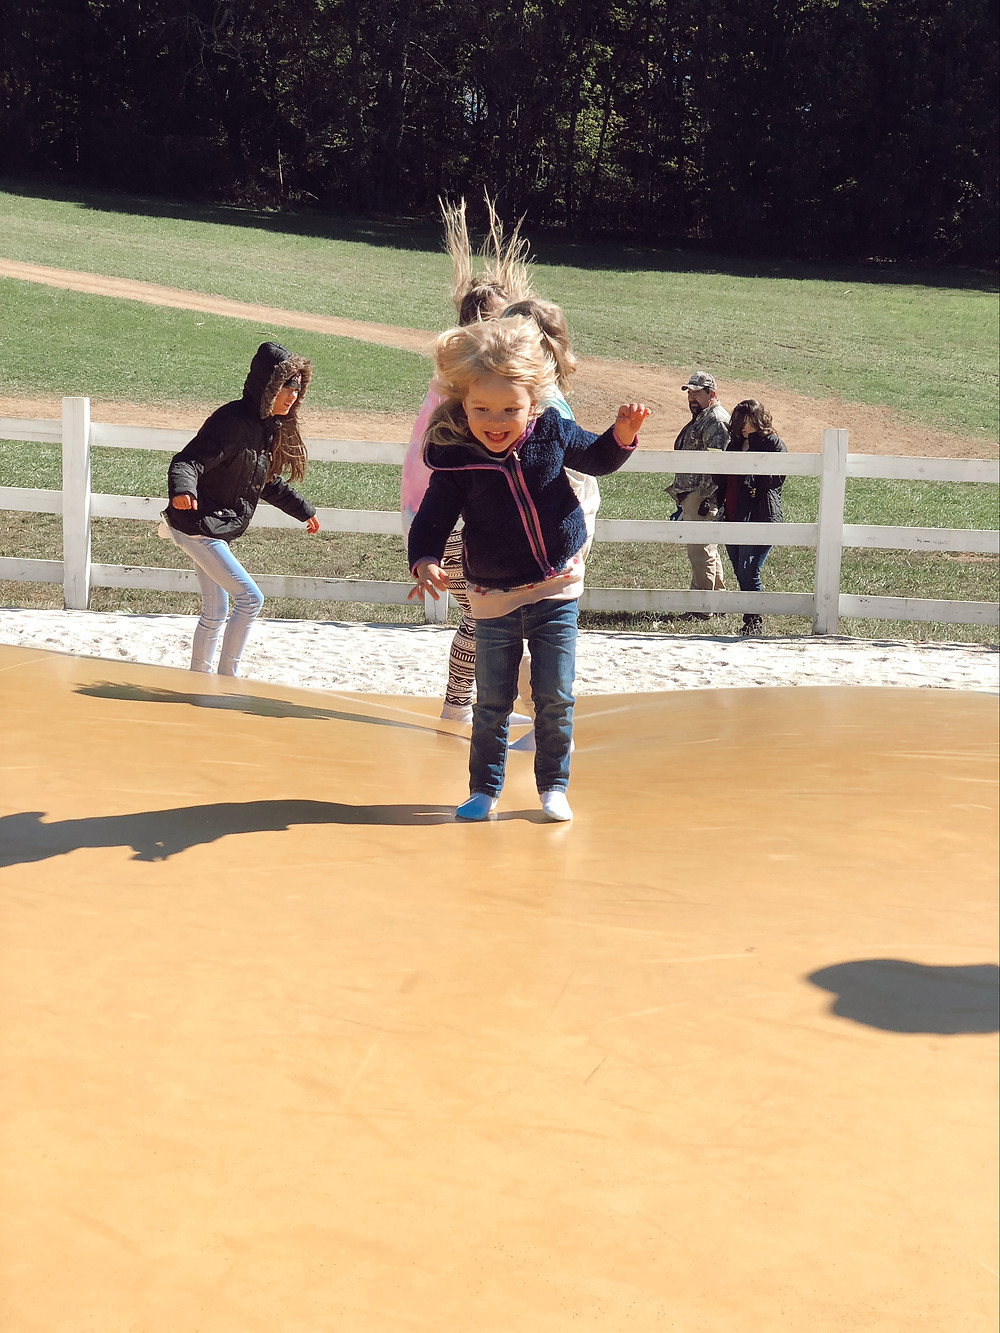 Little girl on jumping pillow at Eliada Home Corn Maze Asheville